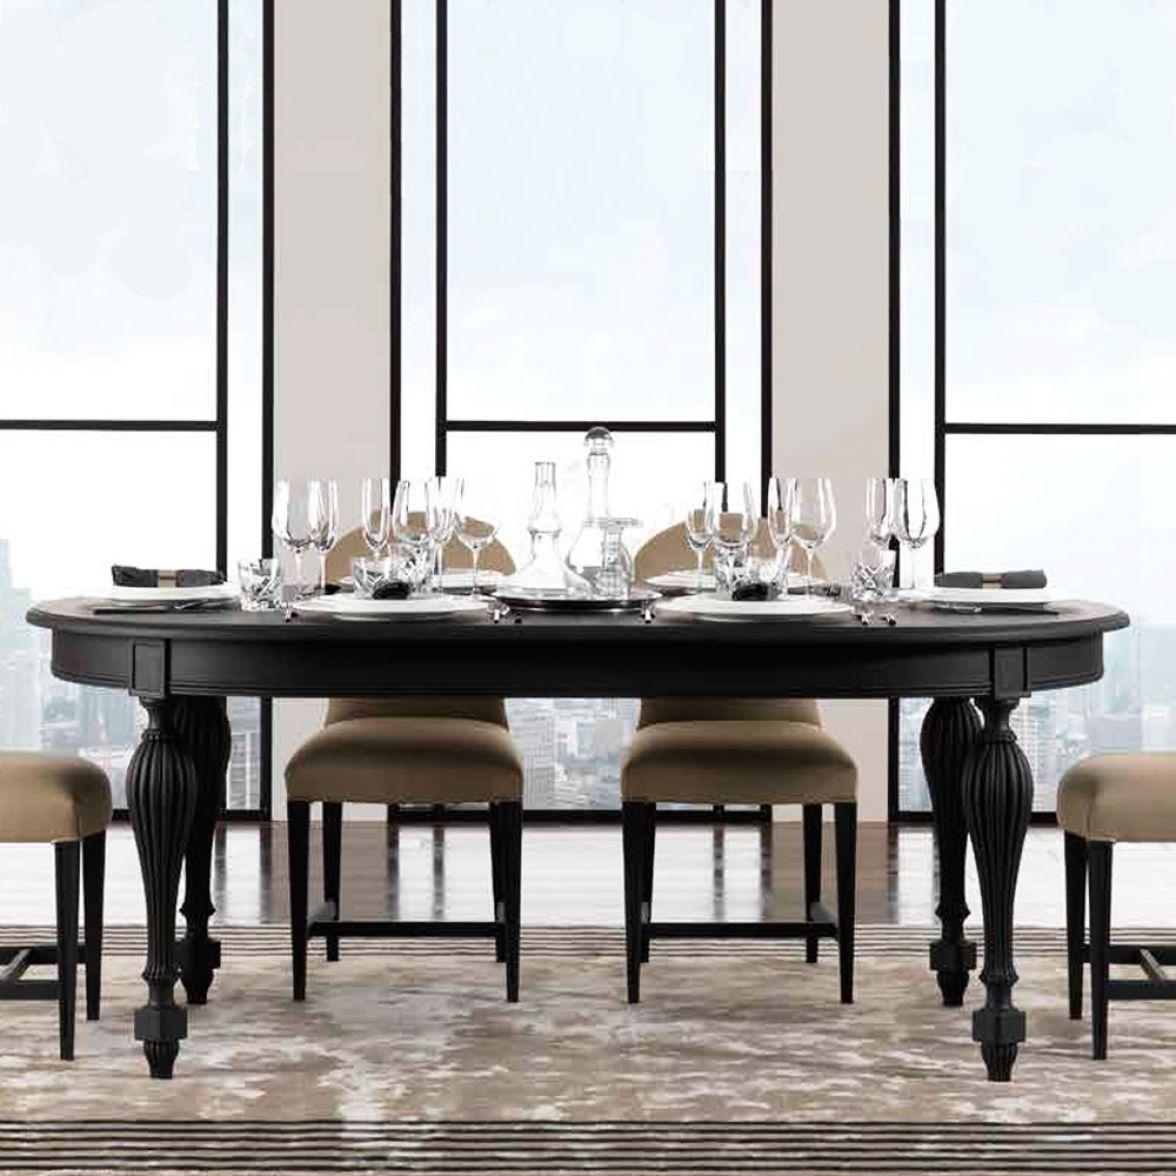 Canova table